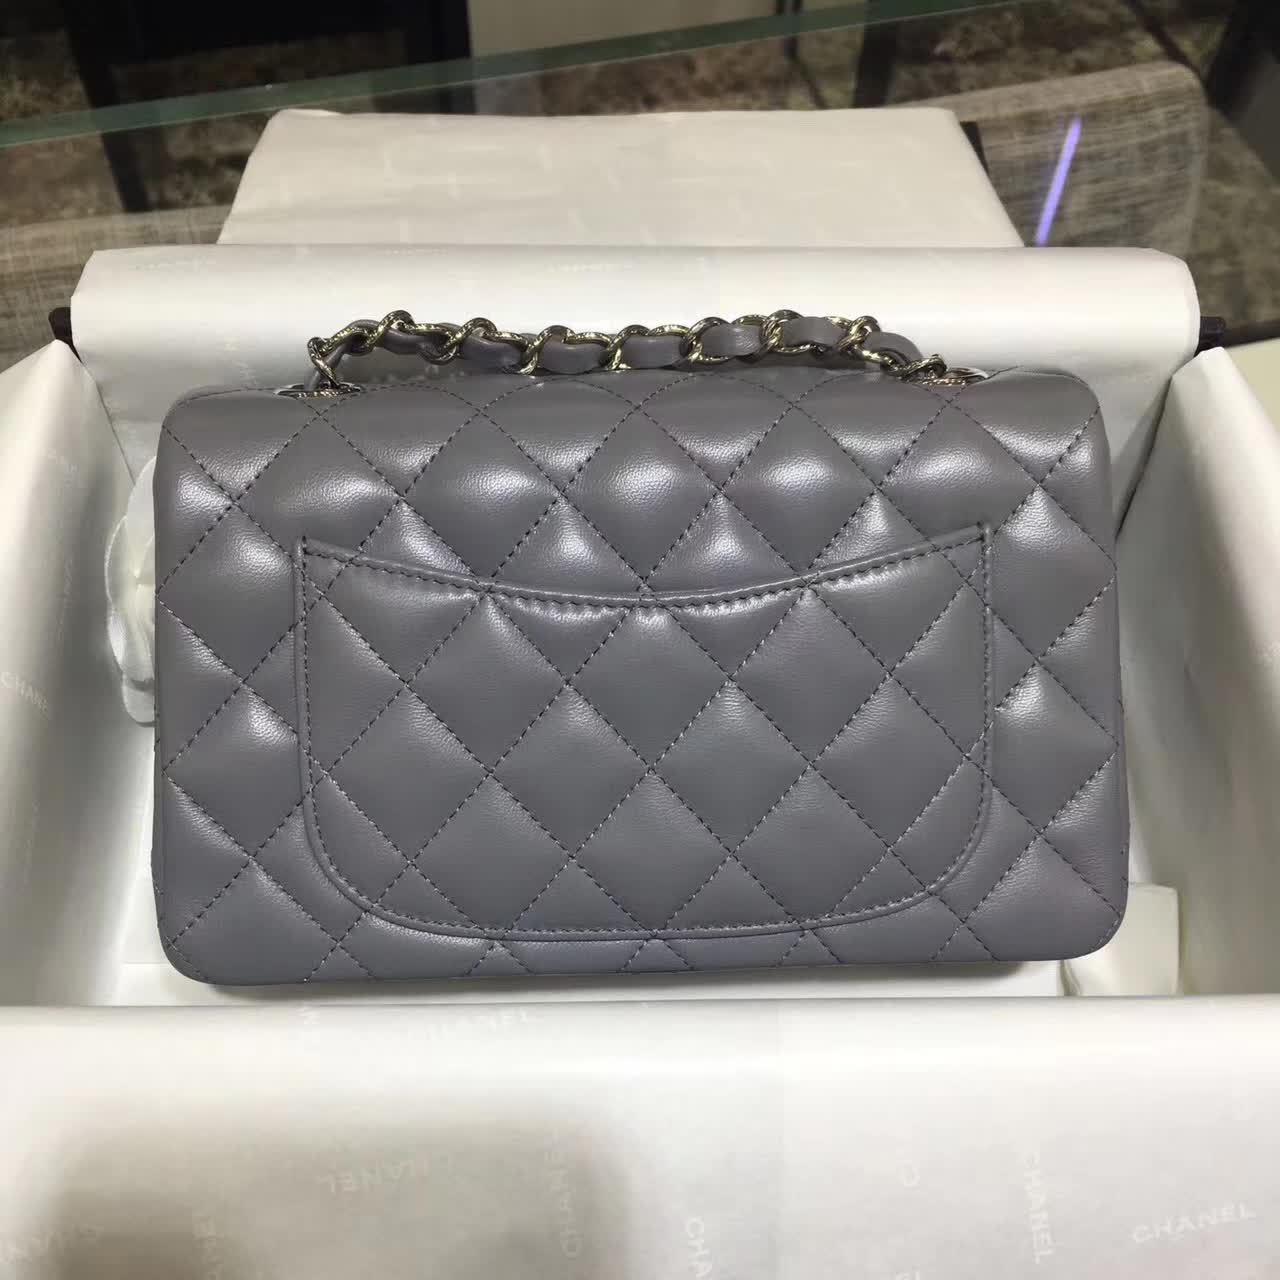 Chanel 香奈儿 Classic Flap 小羊皮 灰色 20cm 五金:银色